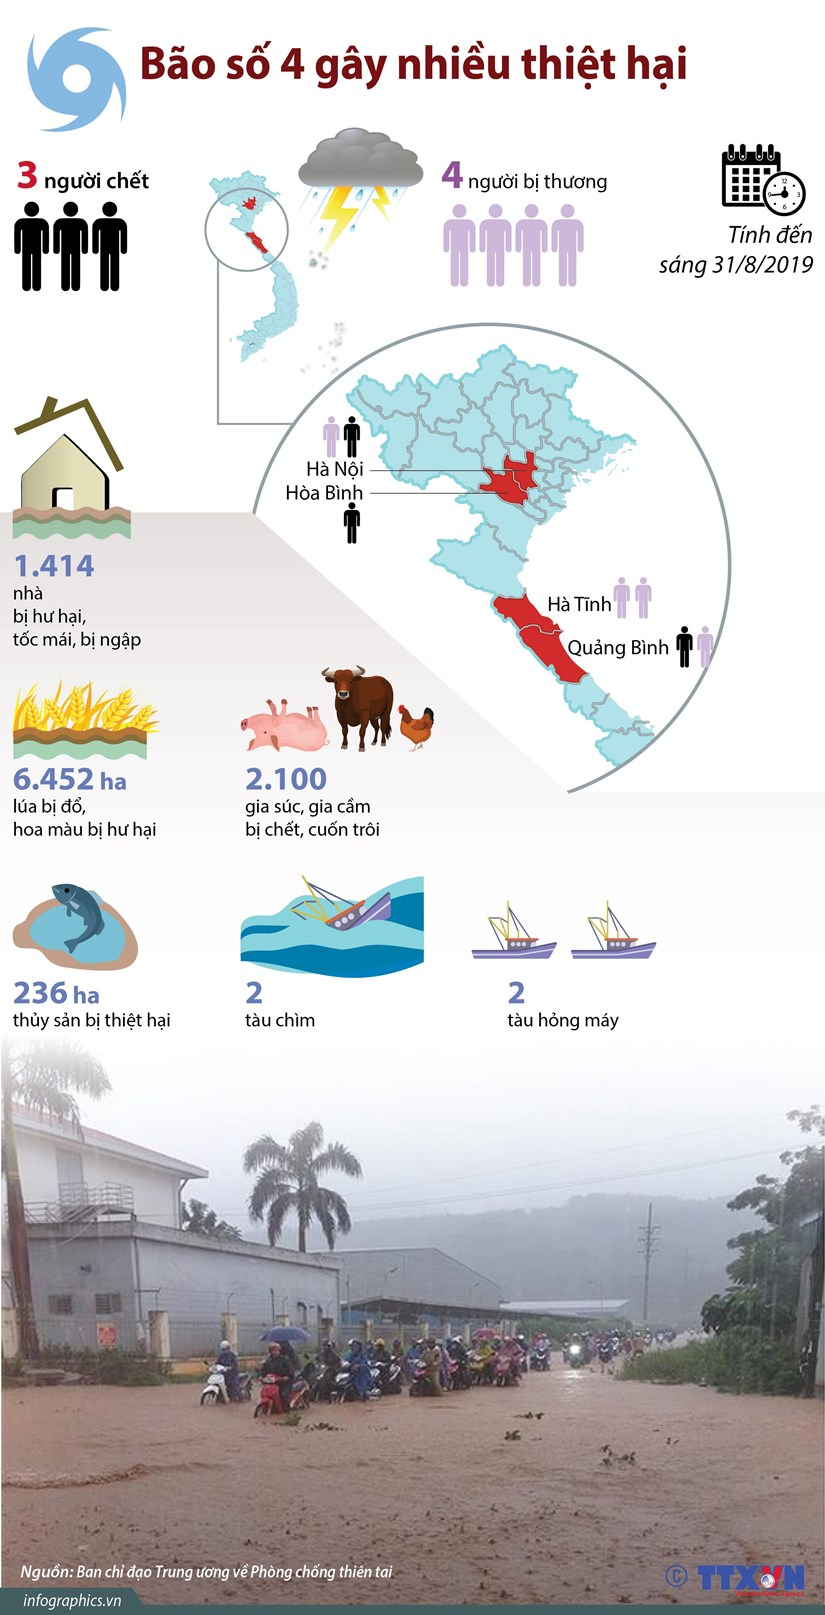 [Infographics] Bao so 4 khien 3 nguoi chet, nhieu thiet hai ve hoa mau hinh anh 1